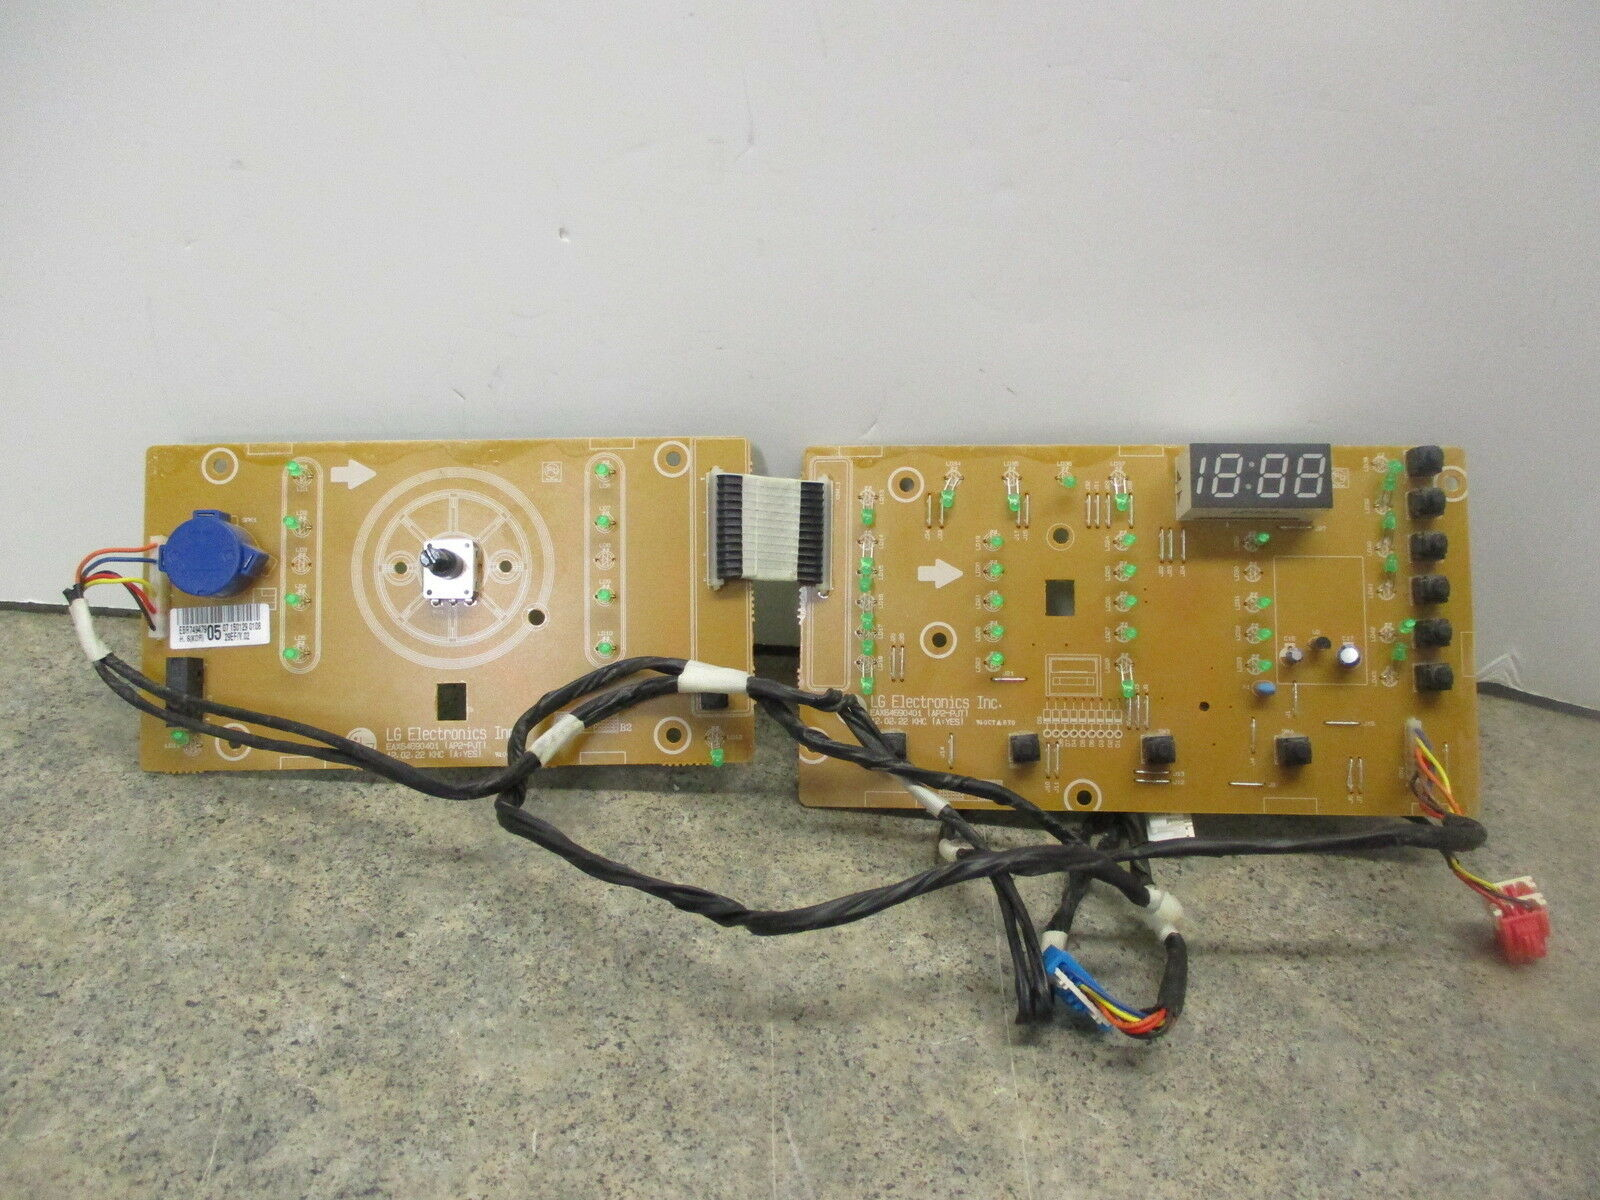 KENMORE DRYER CONTROL BOARD PART # EBR74947905